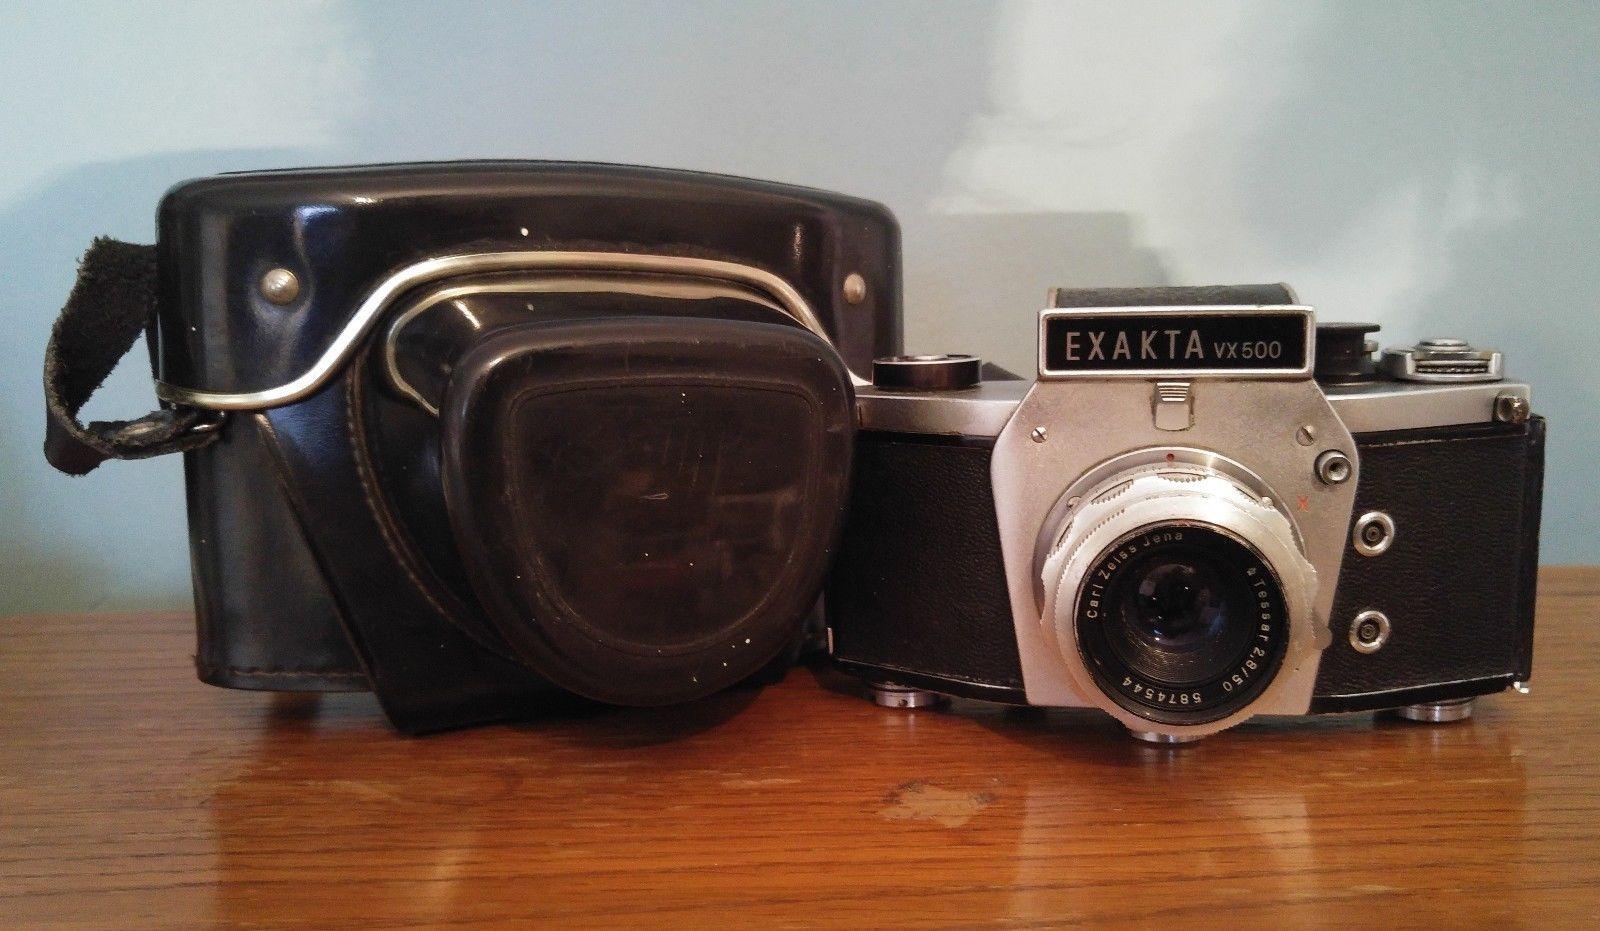 Vintage Exakta VX500 photo film camera with Carl Zeiss Jena Tessar Bayonet Lens | eBay